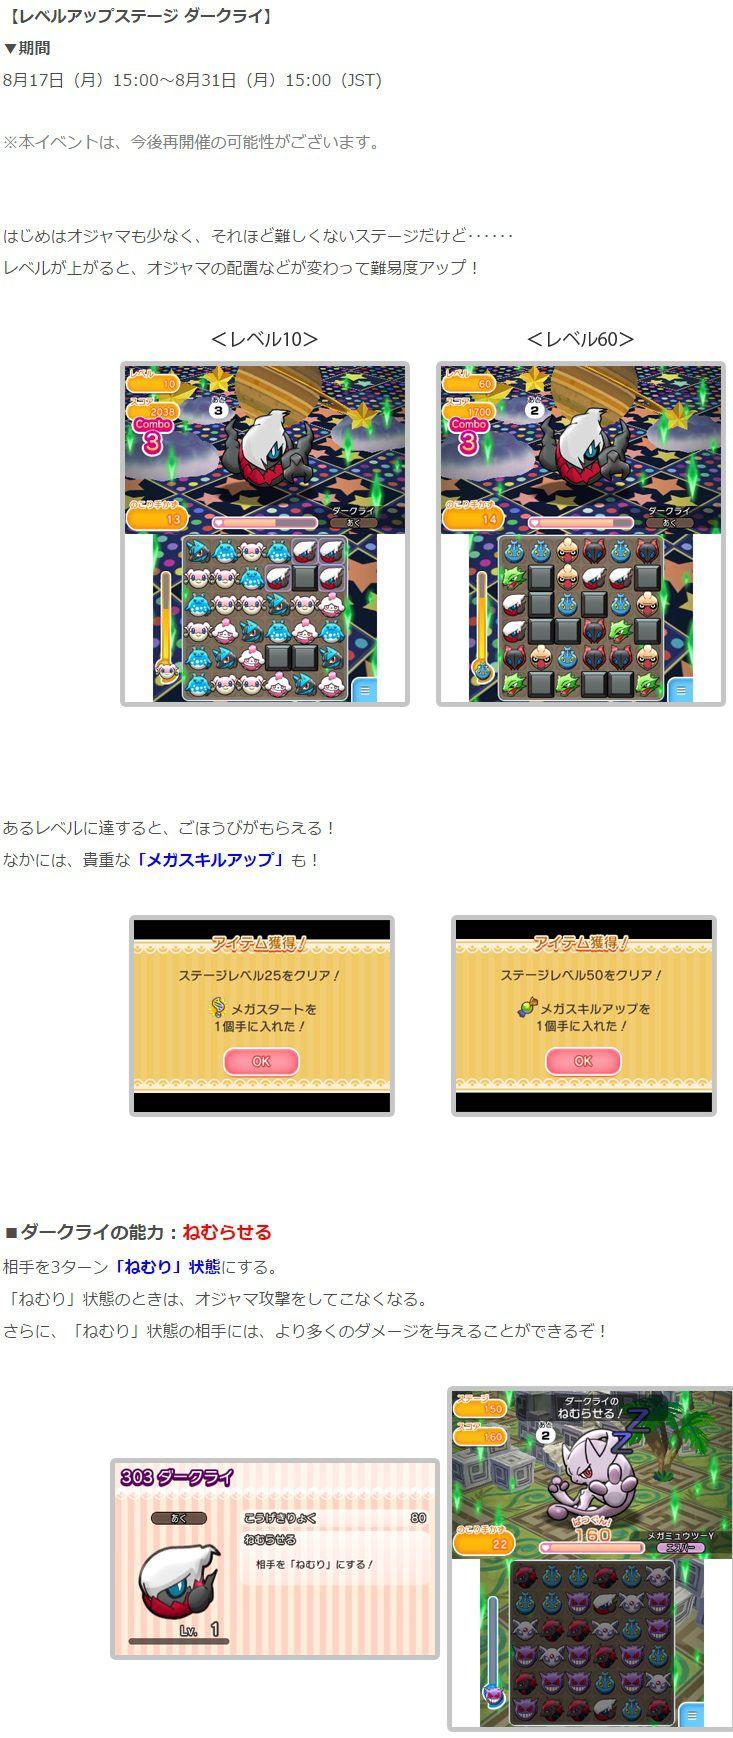 image_5657.jpg